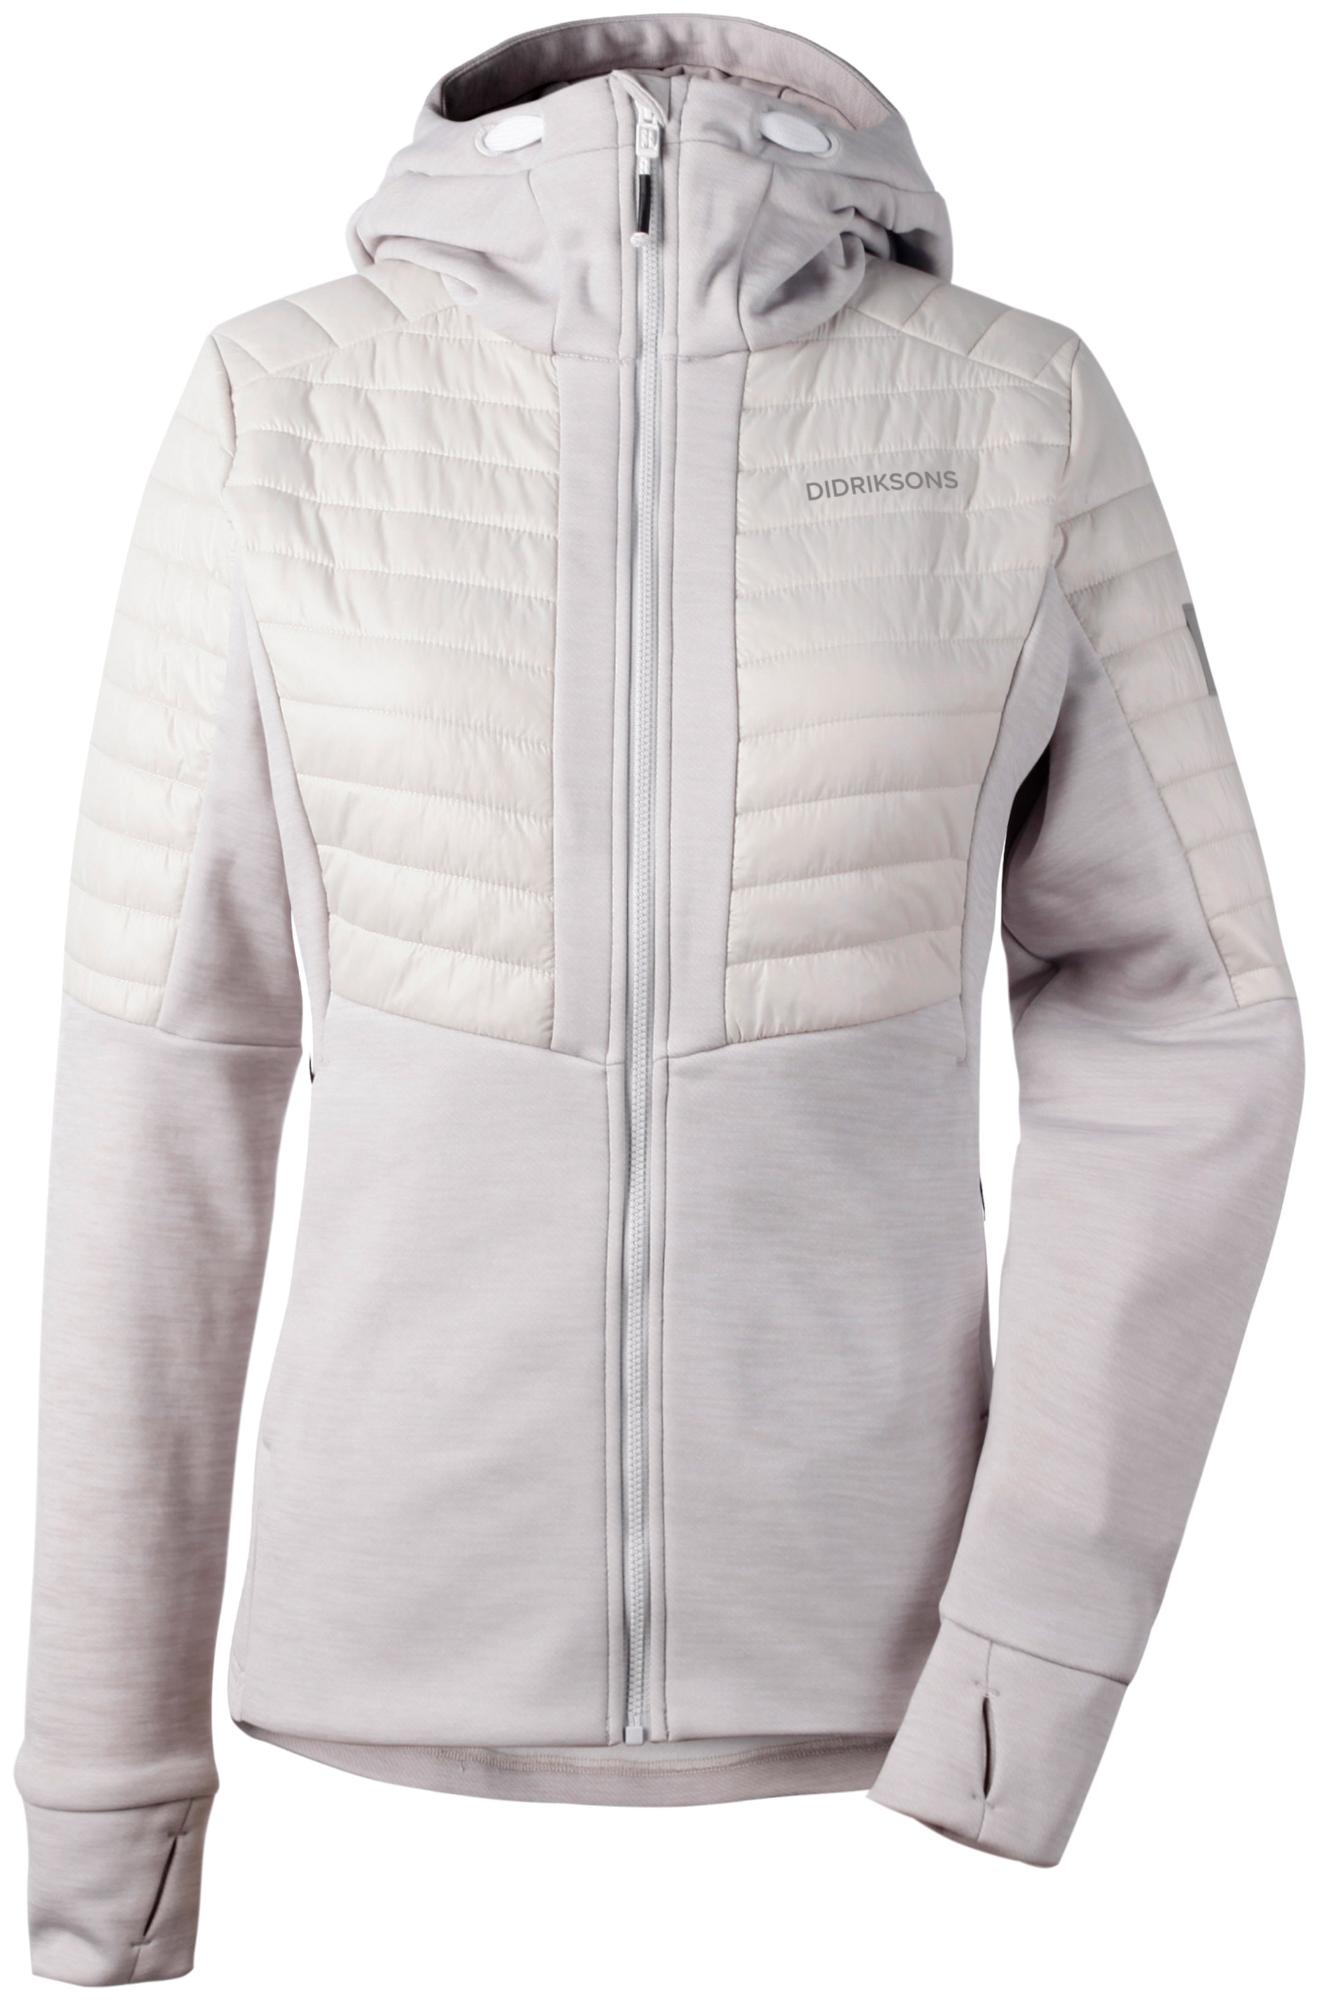 Didriksons Annema Womens Jacket - Softshelljakke Dame - Grå-hvid | Jackets